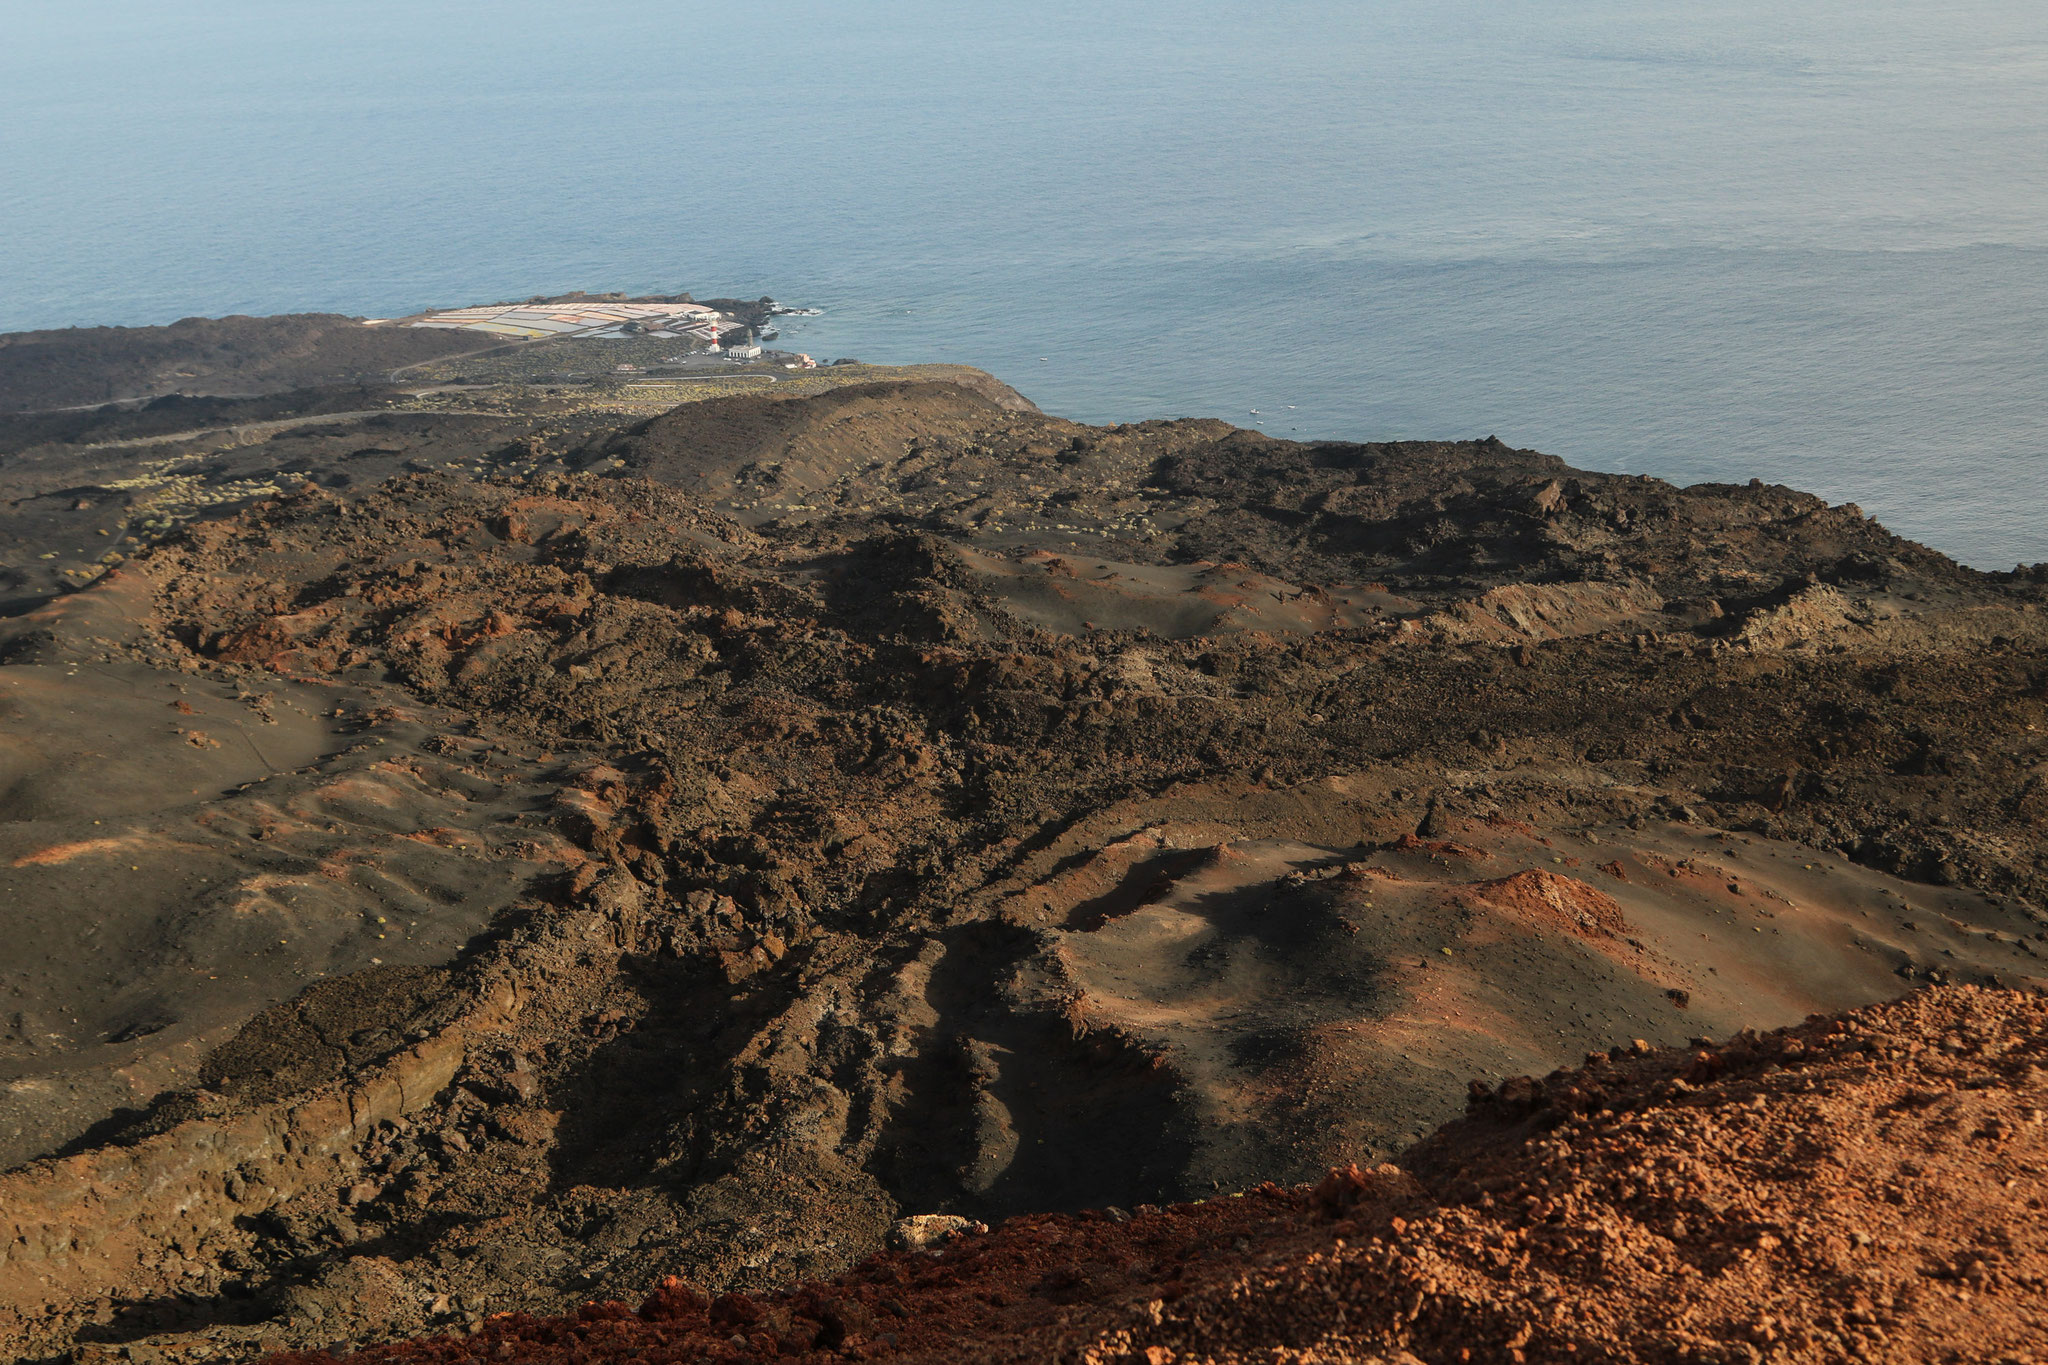 Volcan de Teneguia